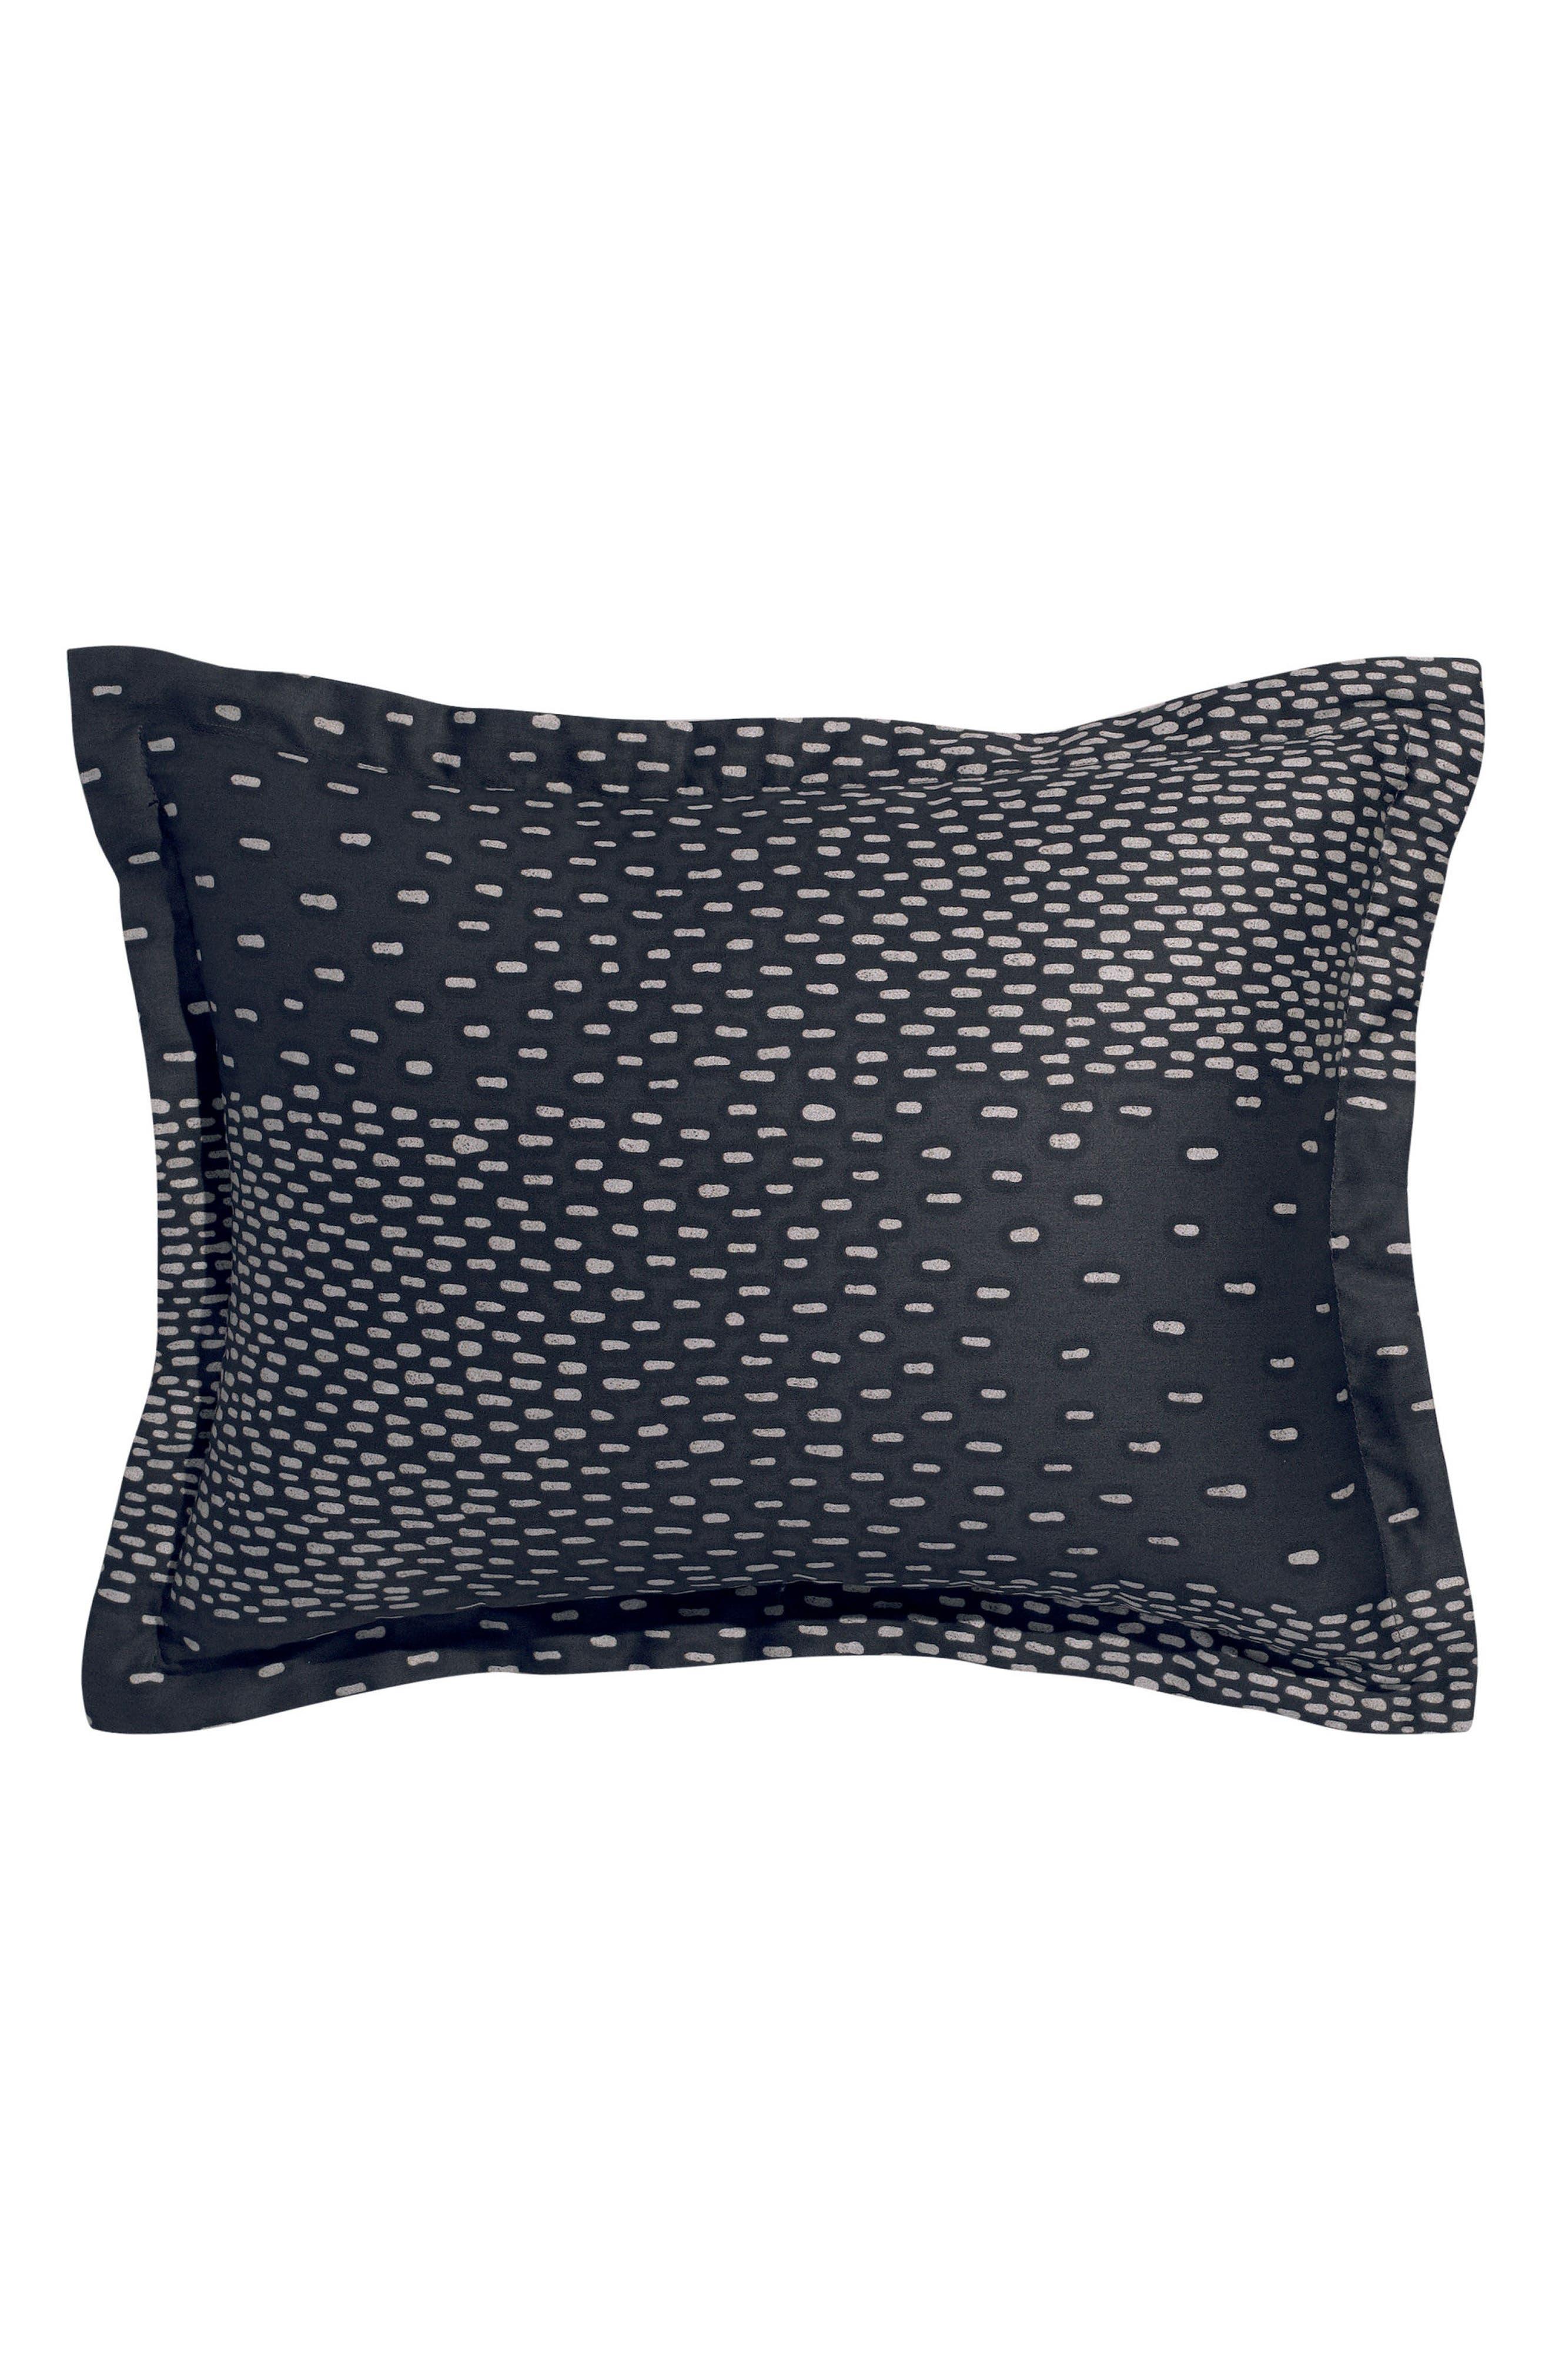 Nova Sky Accent Pillow,                         Main,                         color, Black